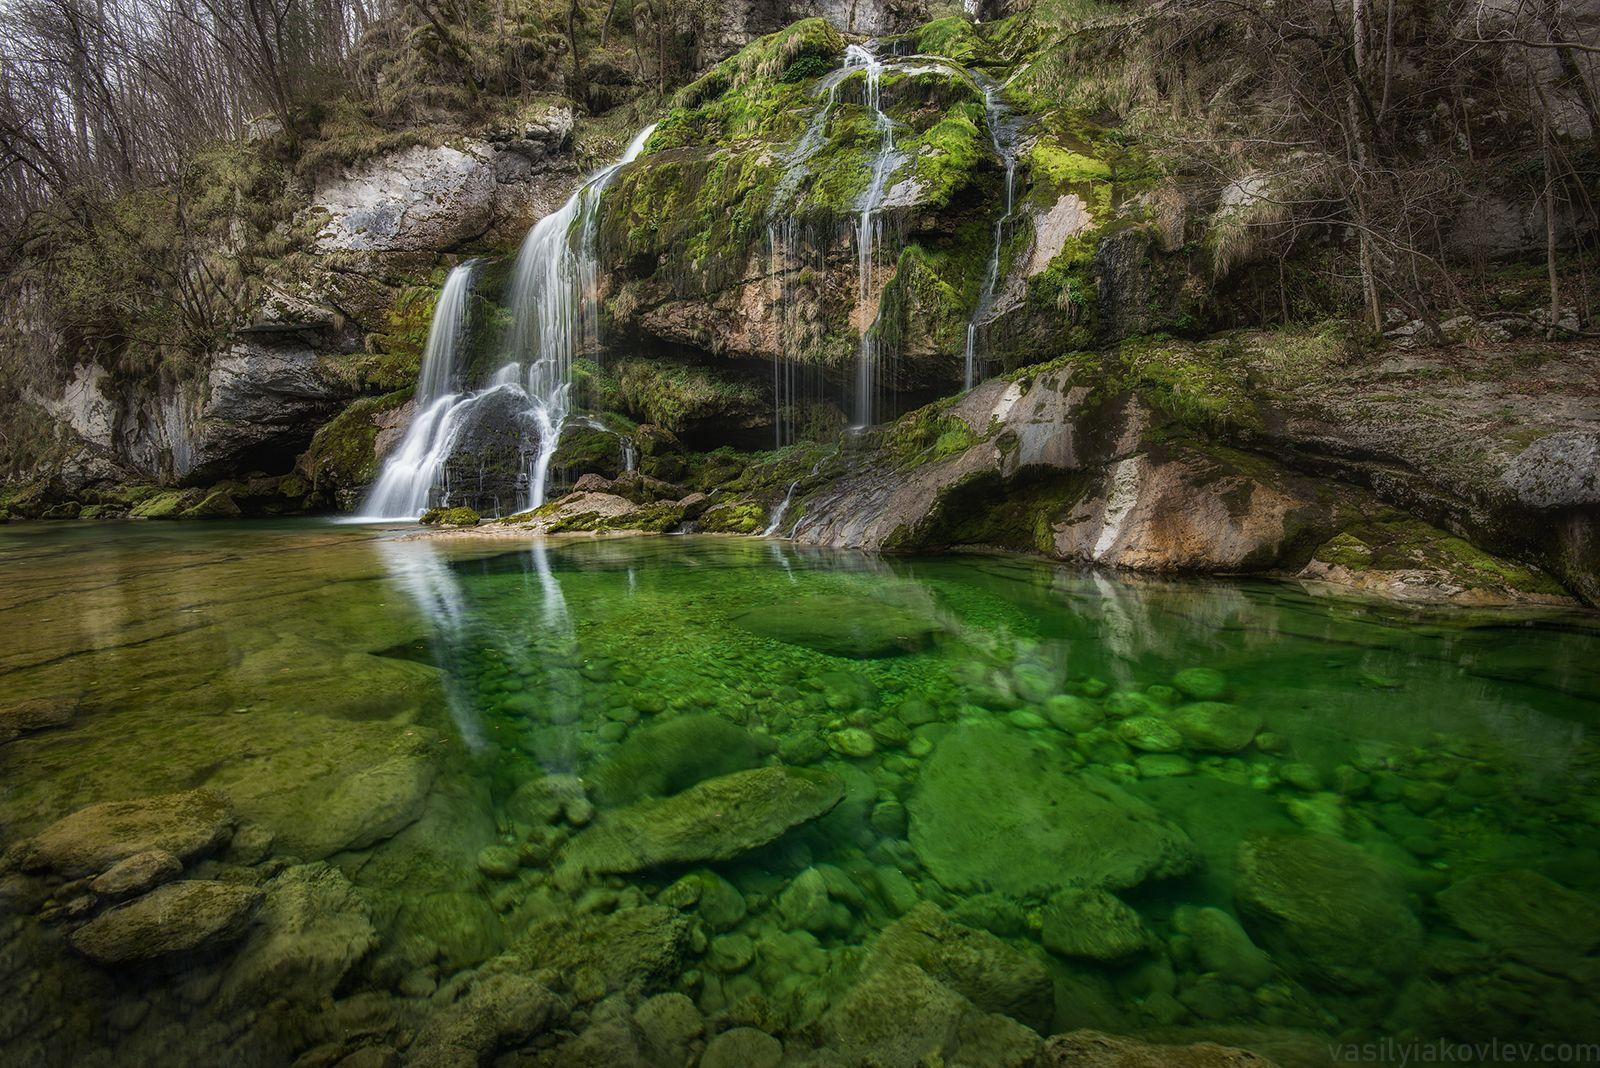 Водопад Virje словения фототур яковлевфототур василийяковлев